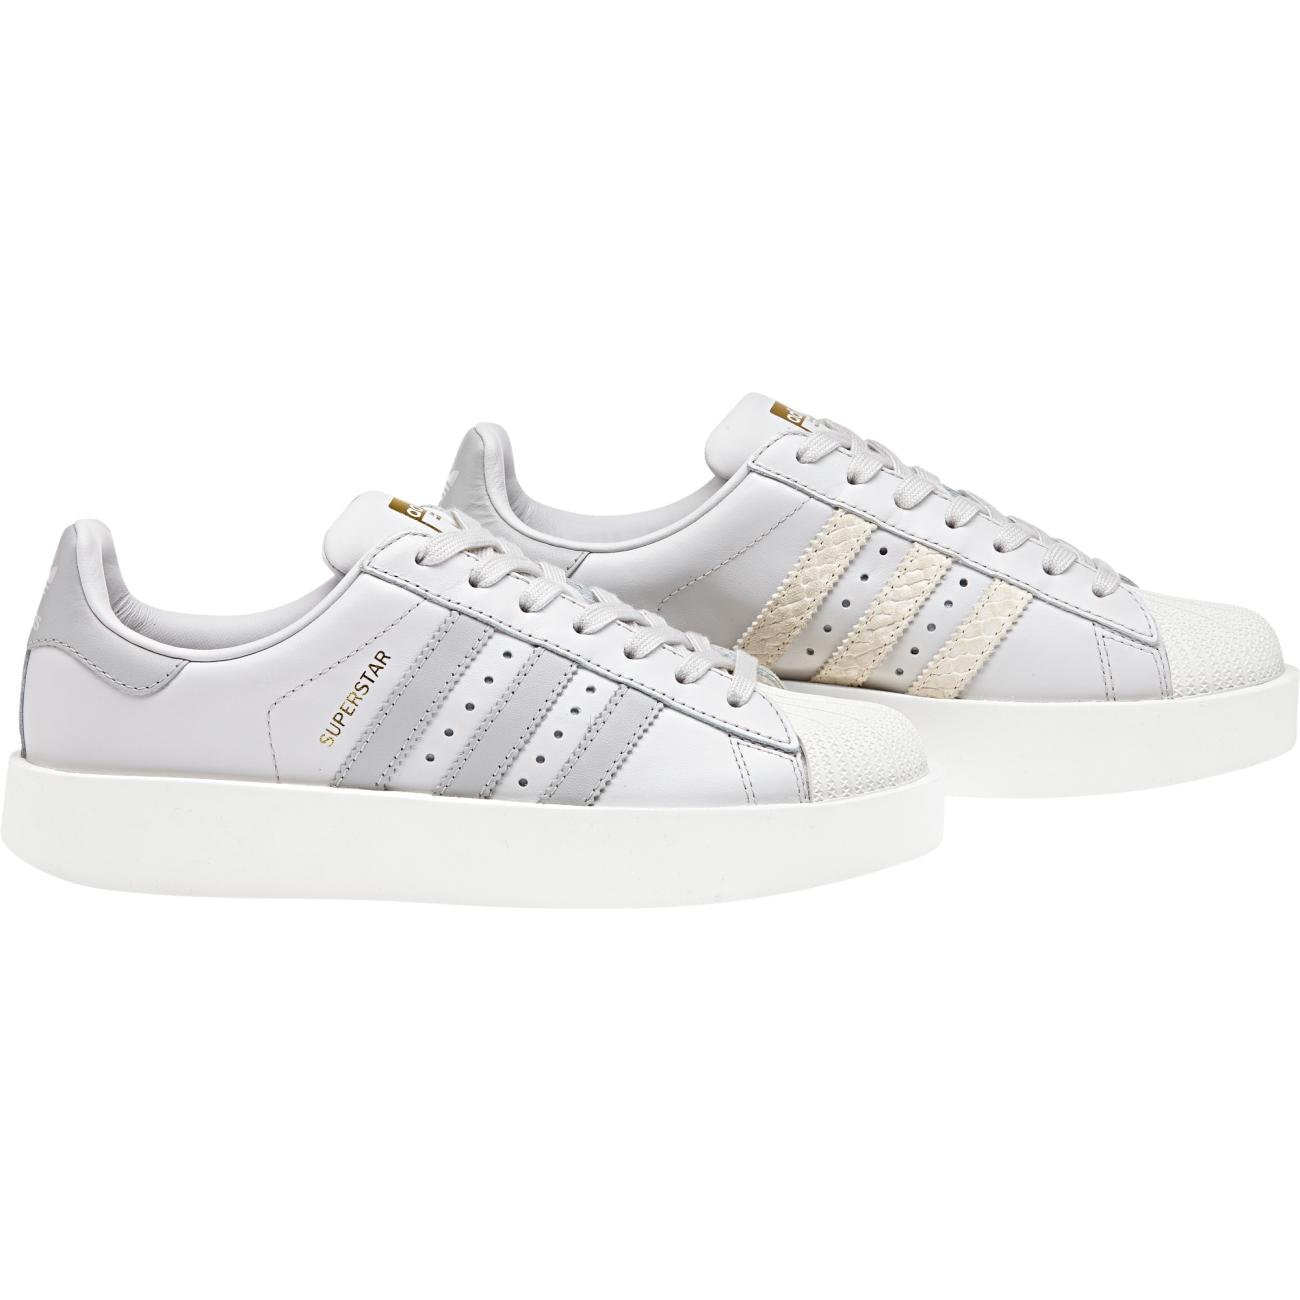 ... Platform Shoes  shades of e6b35 3c177 Adidas Originals Superstar Bold  Platform ... b9e217baaa222